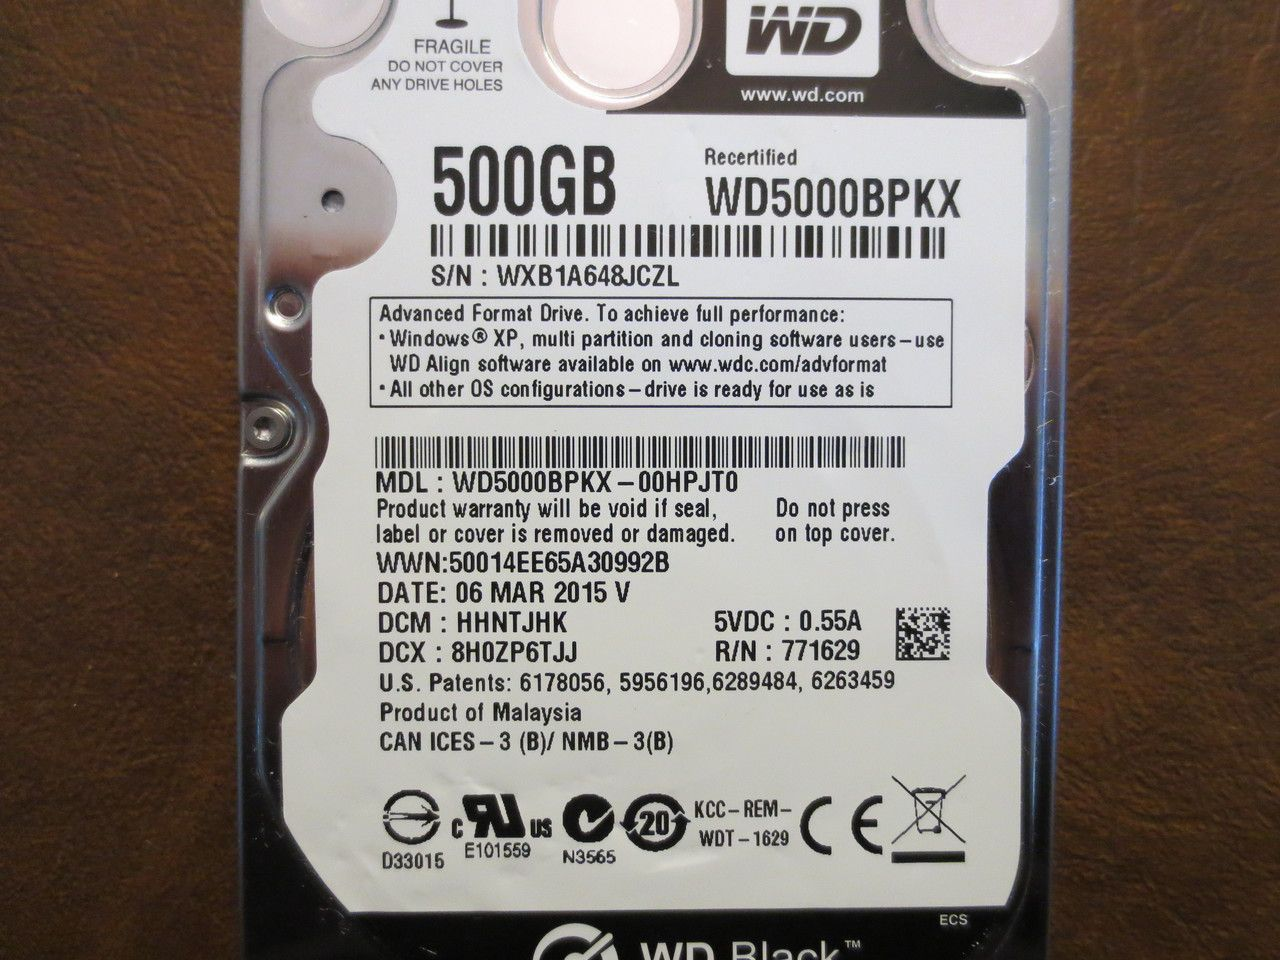 Western Digital Wd5000bpkx 00hpjt0 Dcm Hhntjhk 500gb Sata Computer Repair Digital Data Recovery